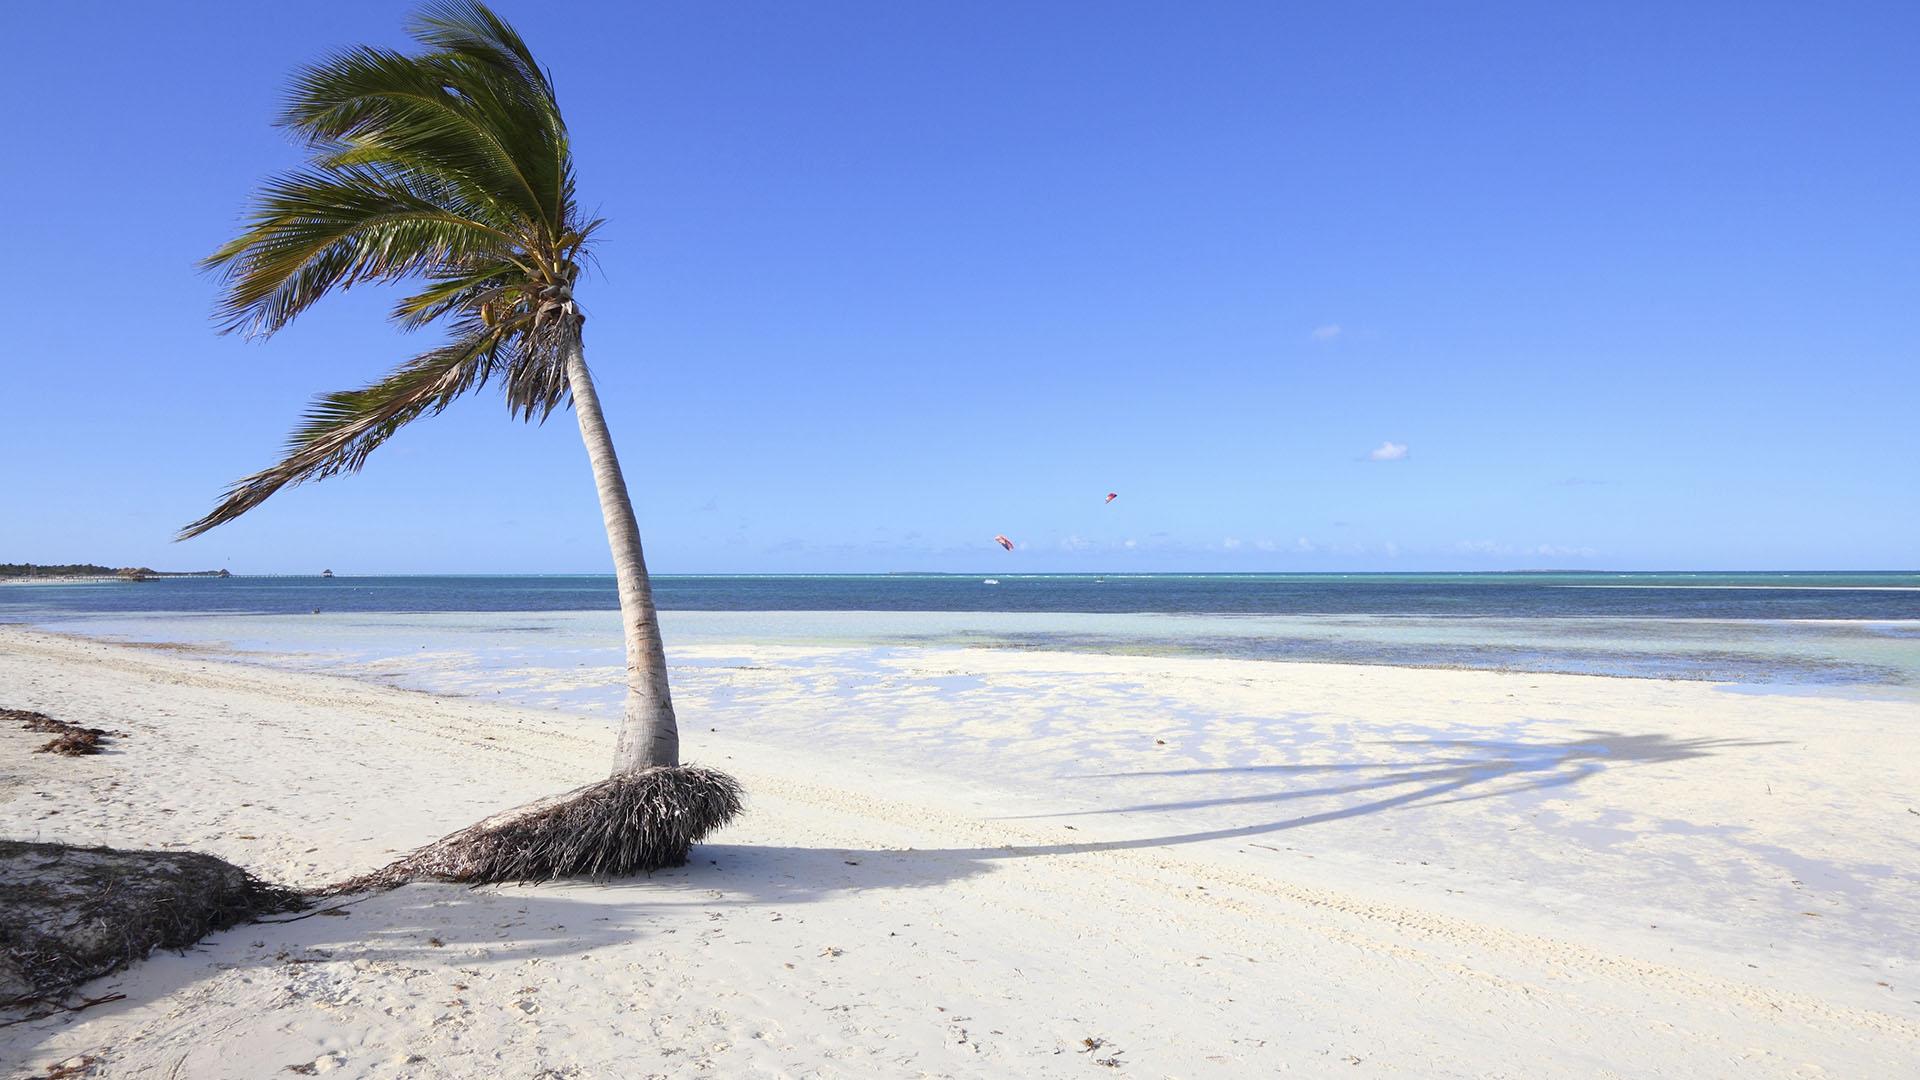 Playas_0021_Cayo-Coco